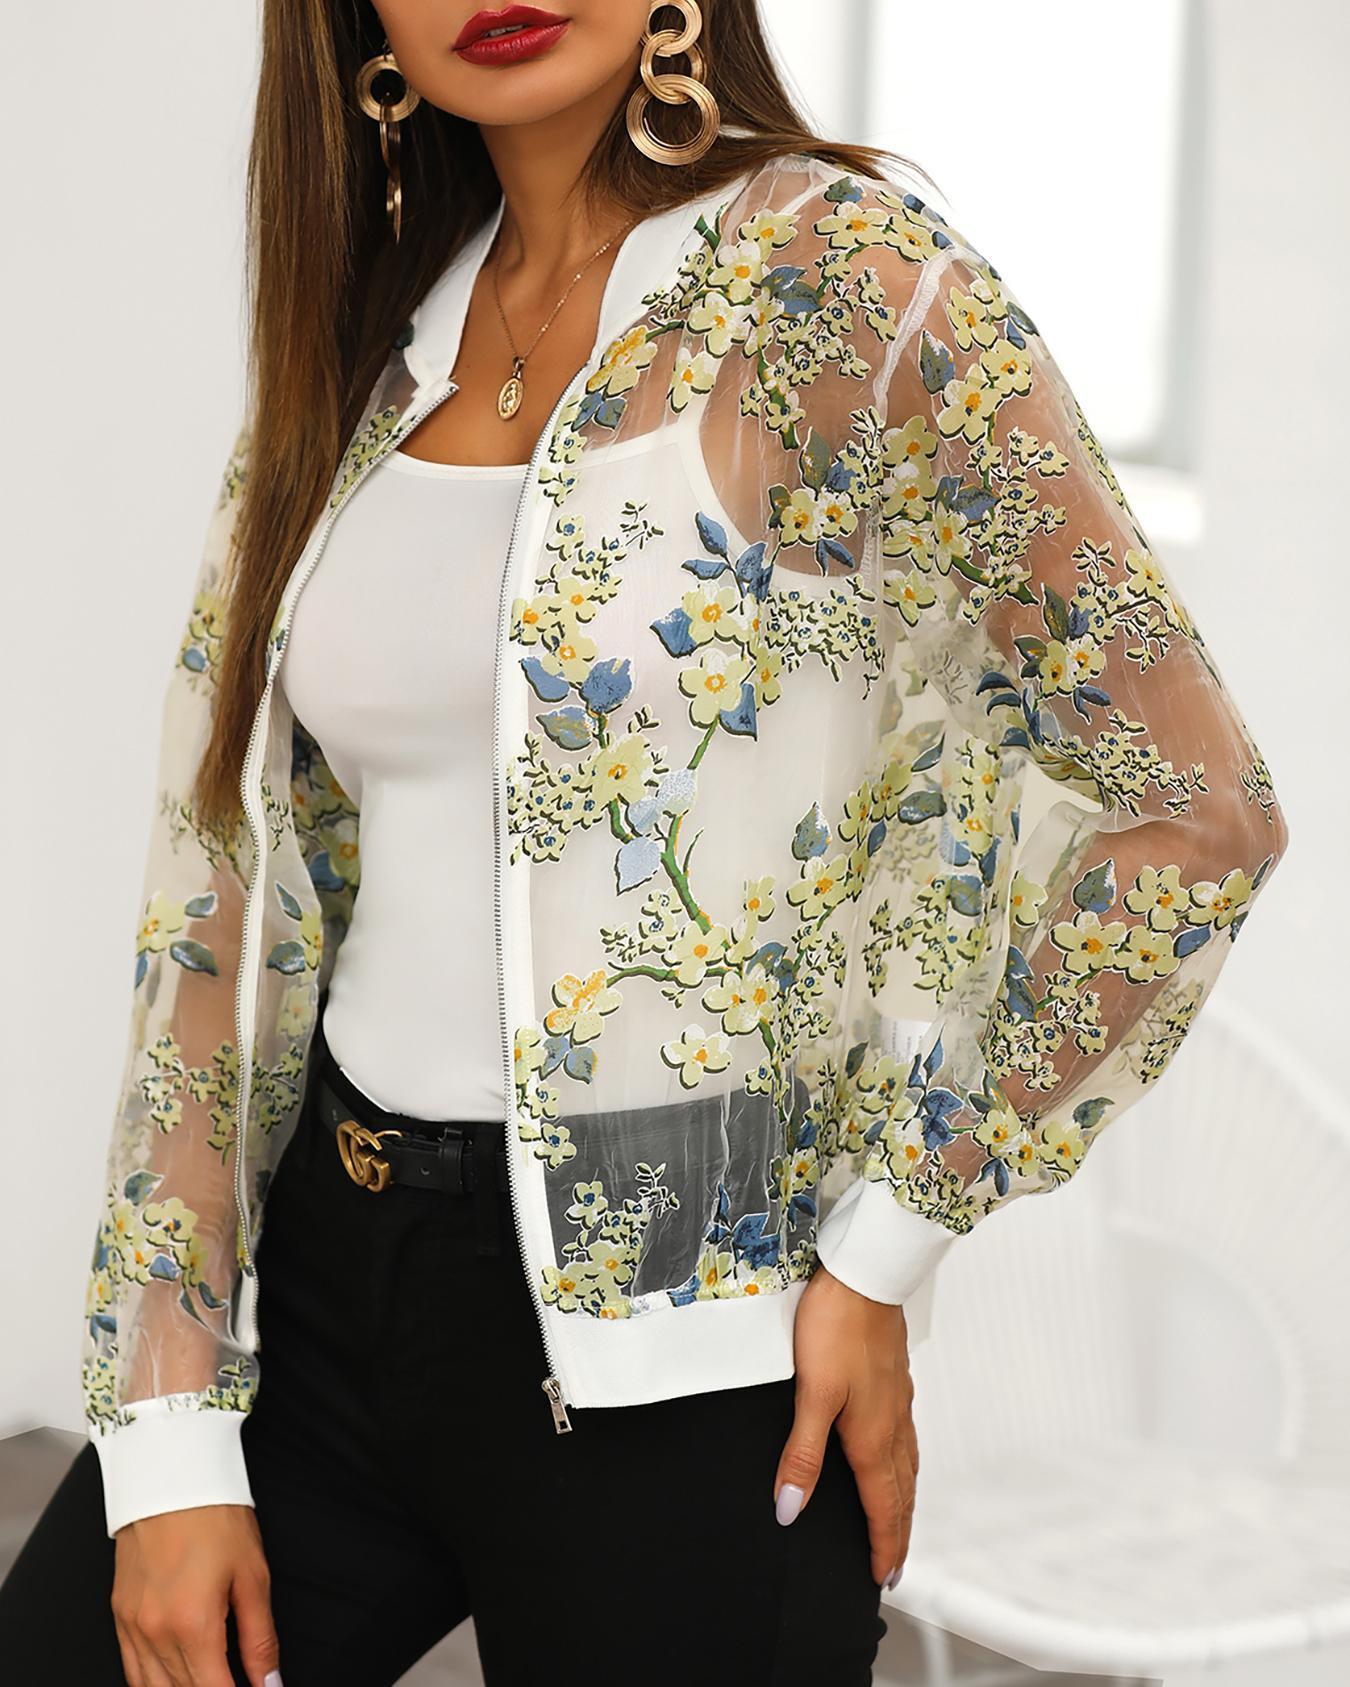 Floral Print Sheer Mesh Zipper Jacket